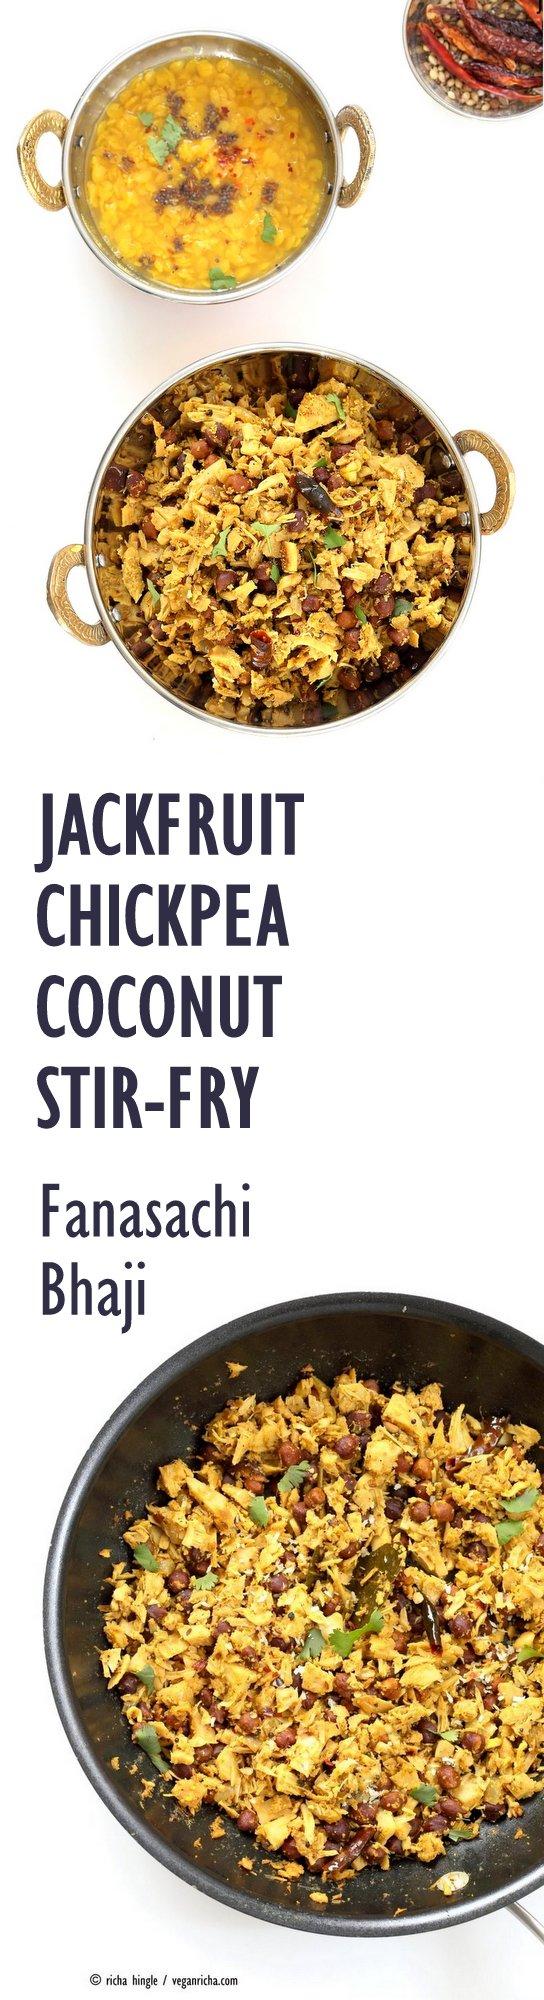 Fanasachi Bhaji - Maharashtrain Jackfruit Brown Chickpea Coconut Stir fry with coconut, sesame, Indian spices. #Vegan #Glutenfree #Soyfree #Side #Recipe.| VeganRicha.com